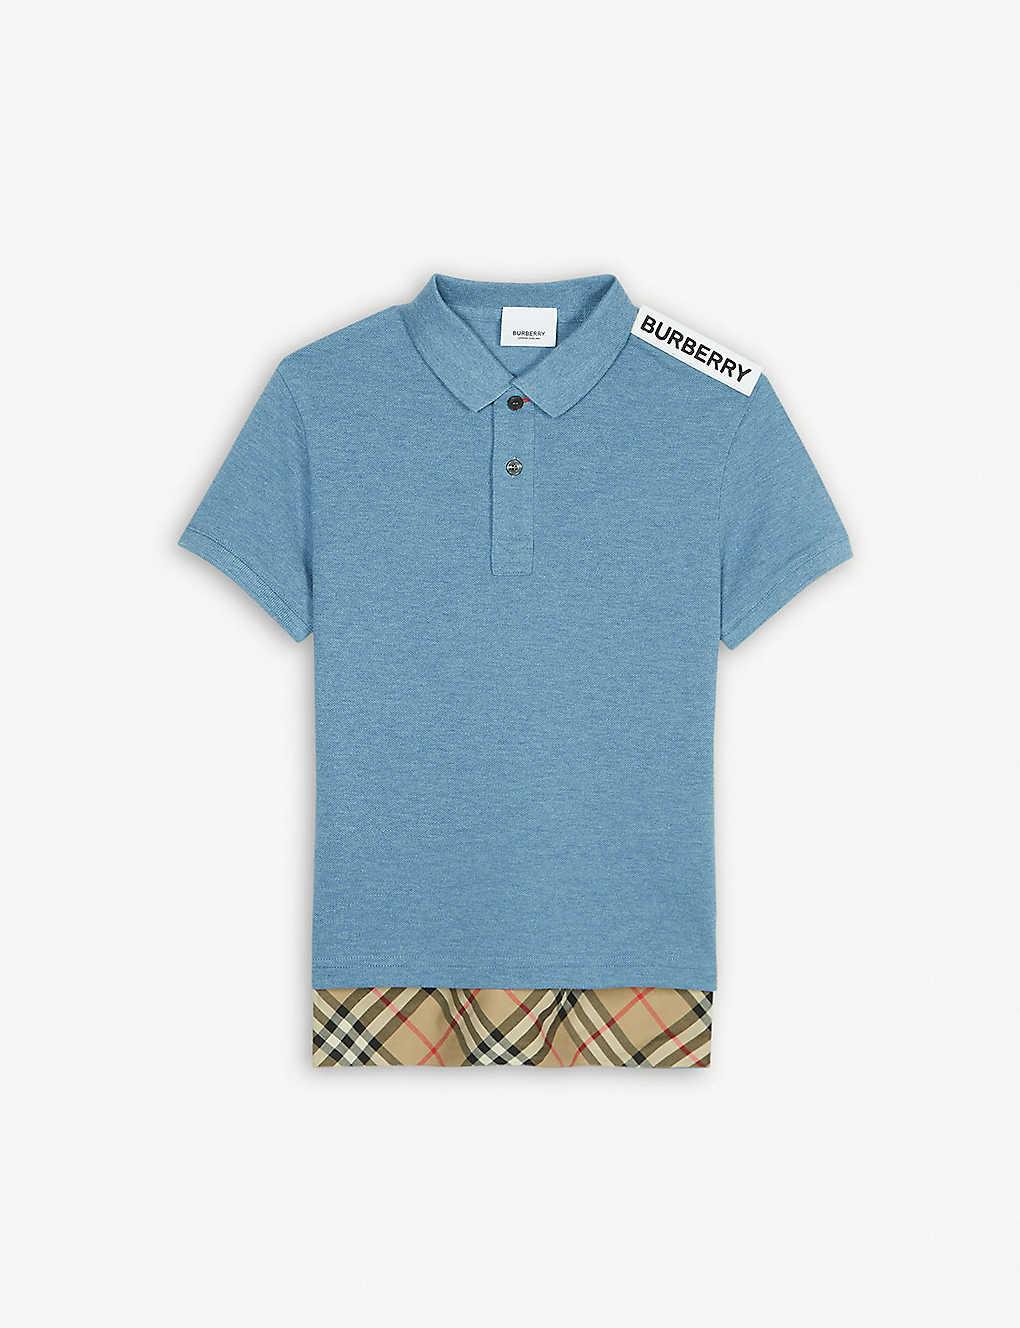 ebd1103d BURBERRY - Long hem cotton polo shirt 3-14 years | Selfridges.com